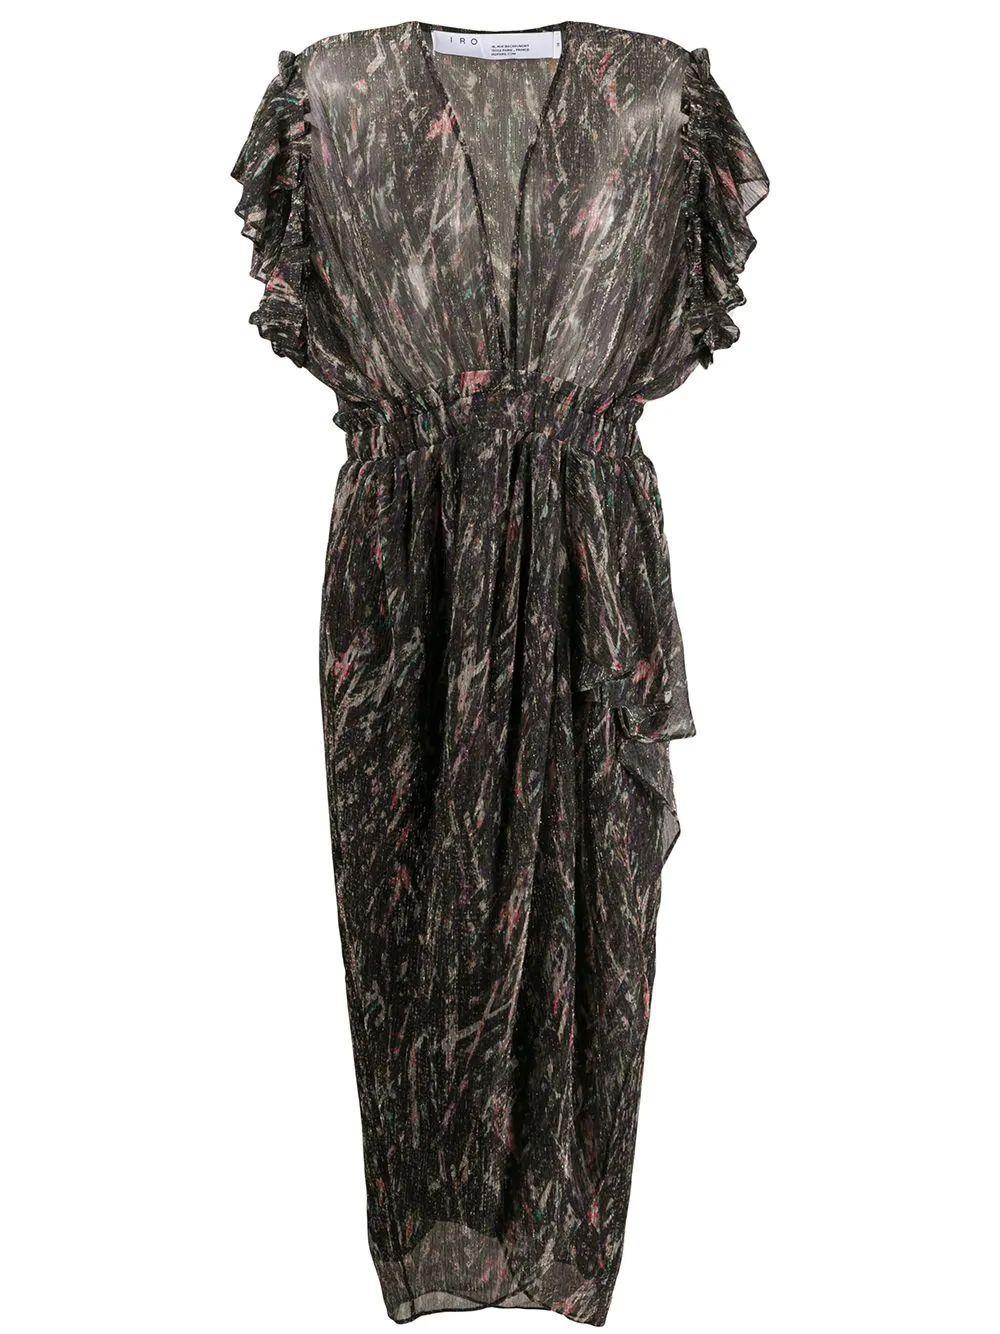 Ruffle Sleeve Midi Dress Item # GARGAS-C